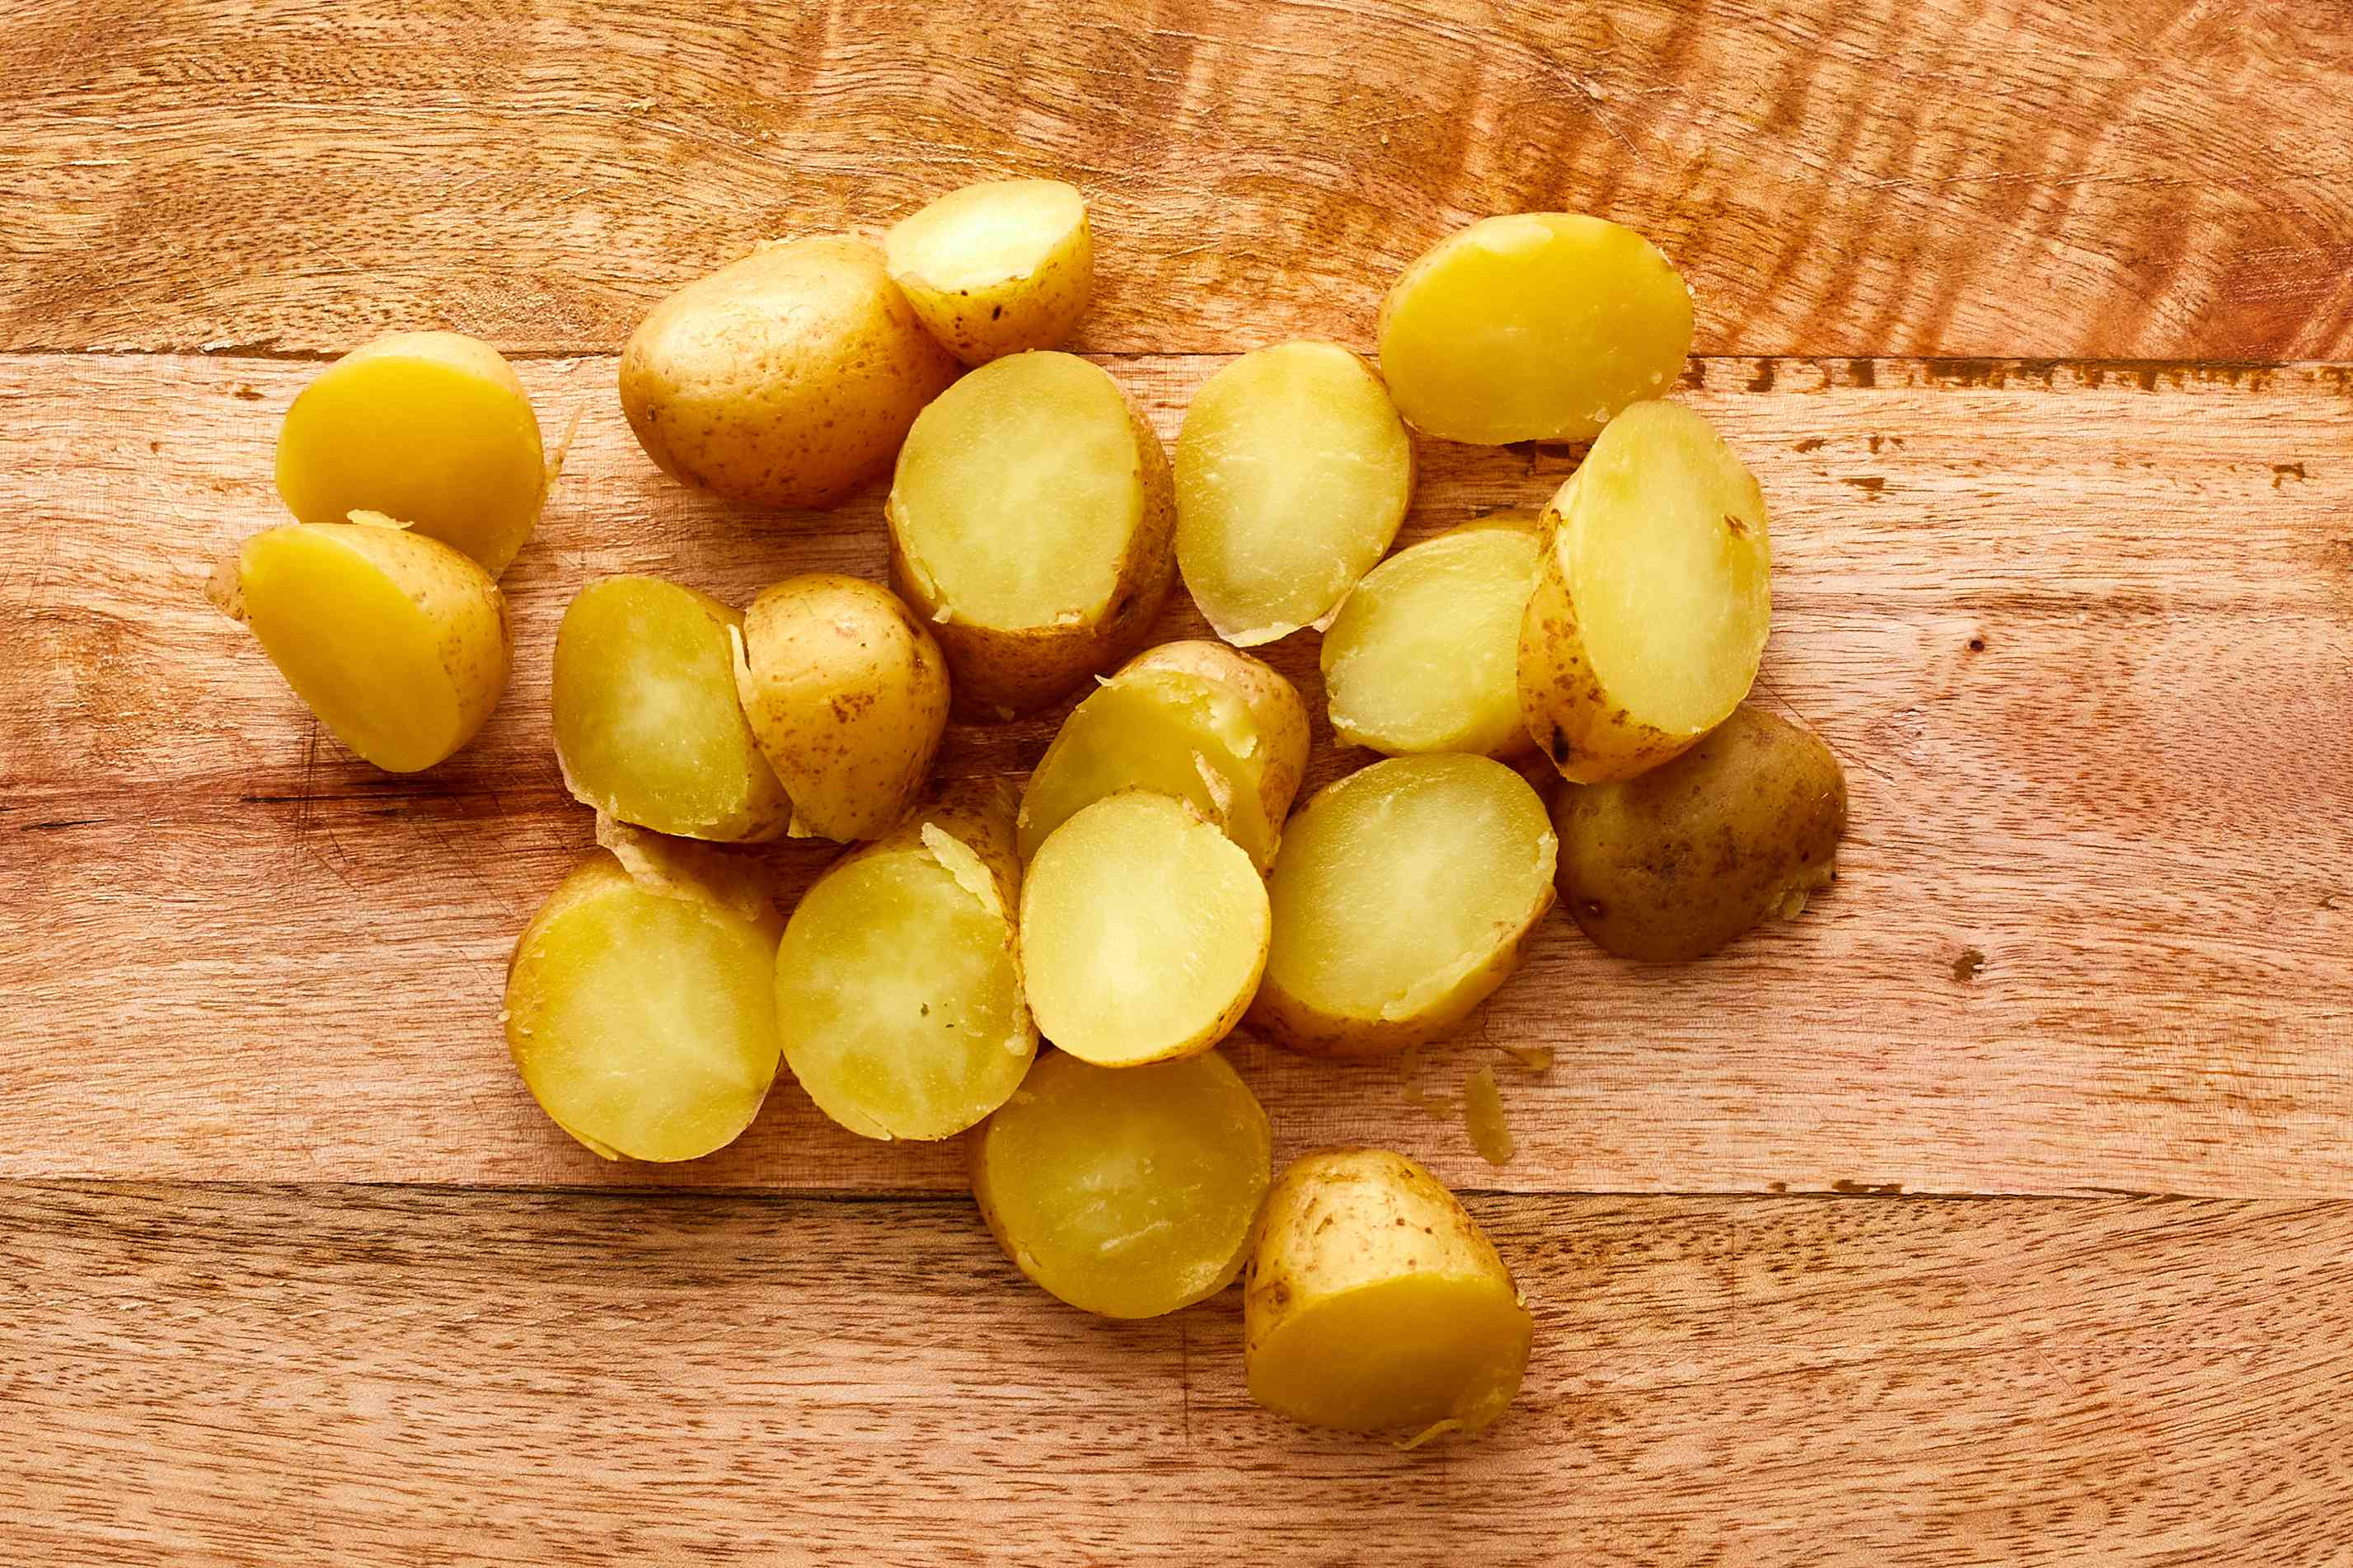 Cooked potatoes on cutting board cut in half